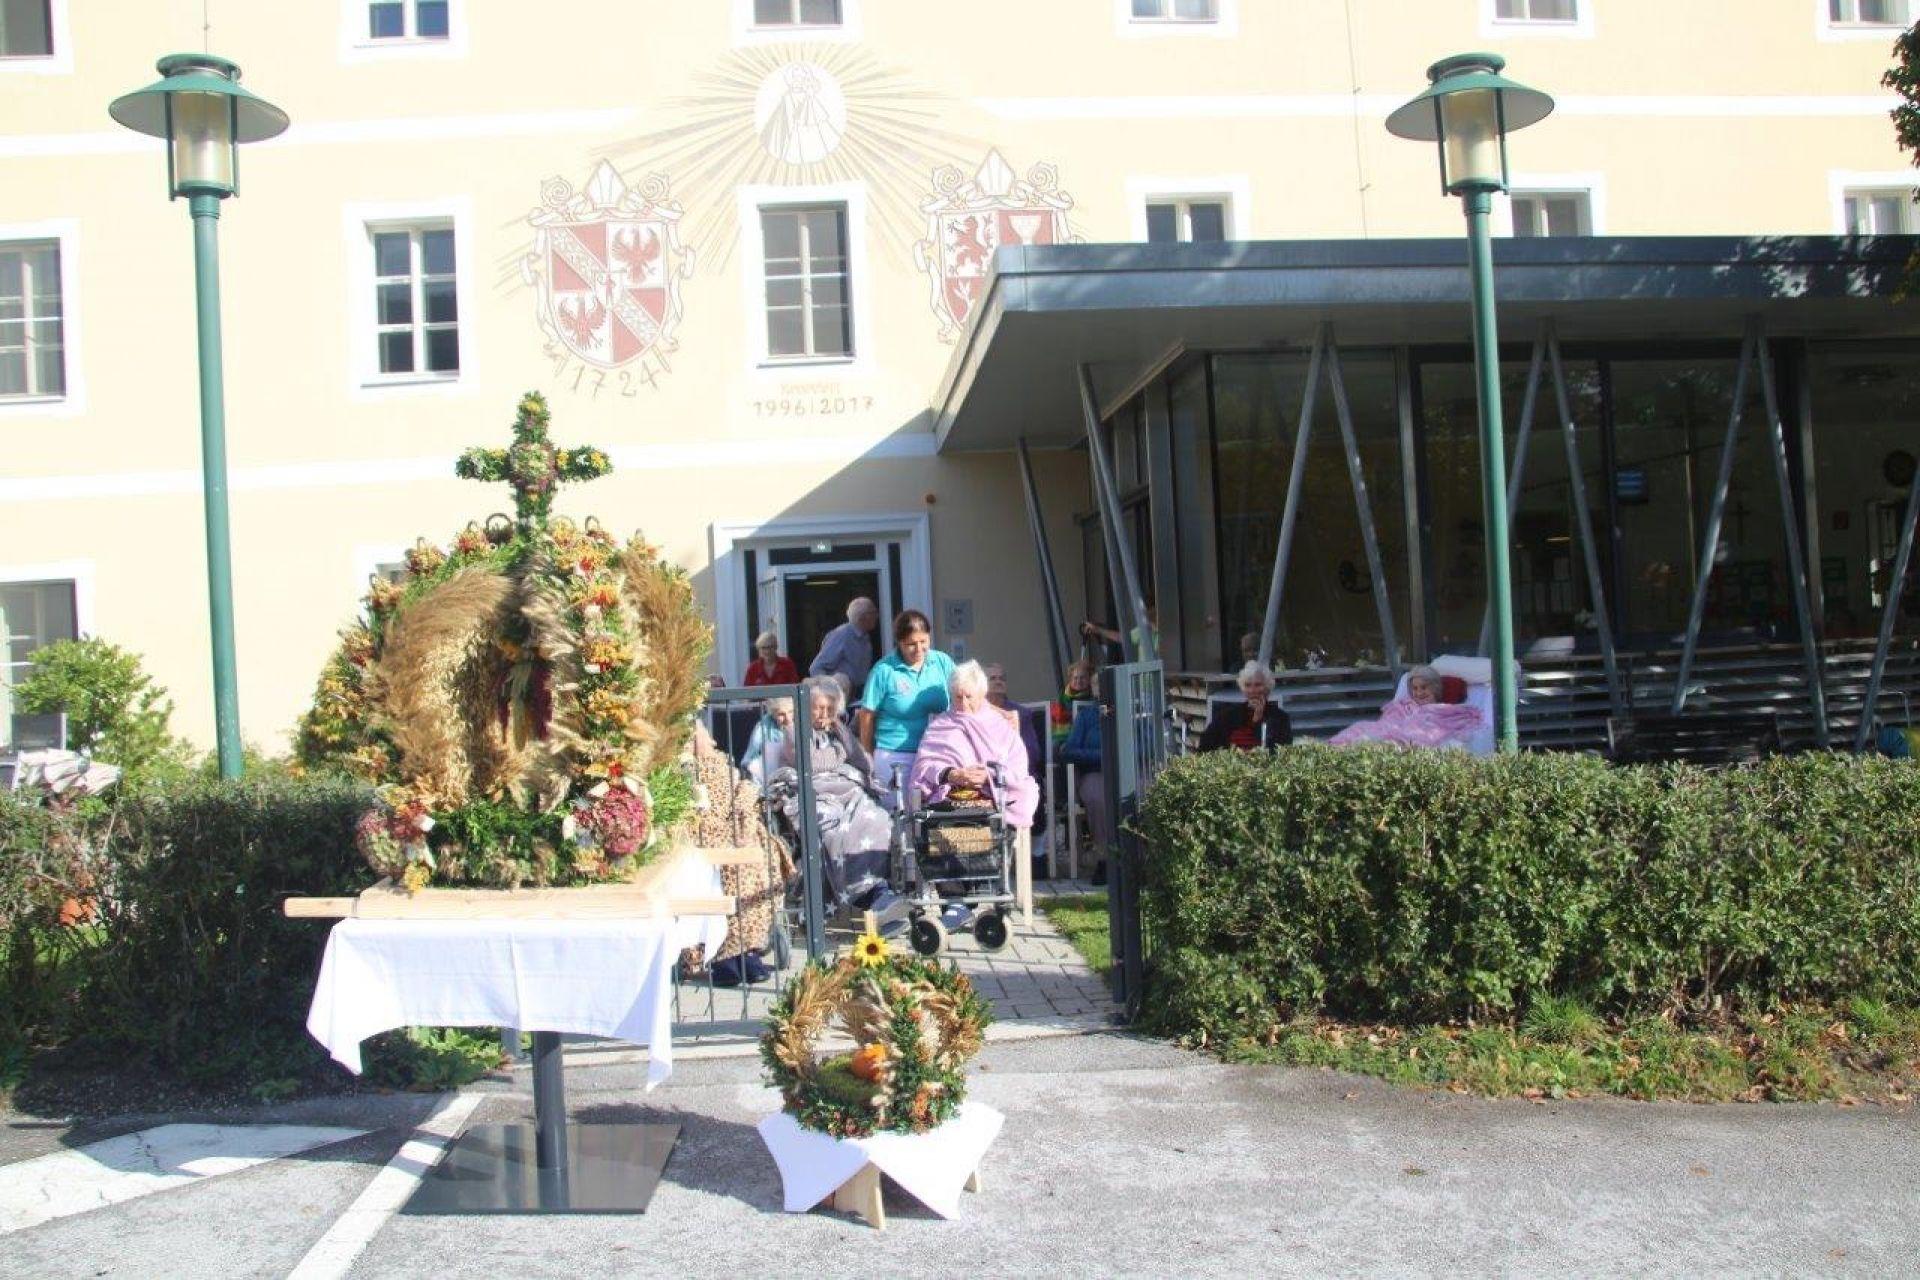 Erntedankfeier in Frauenberg